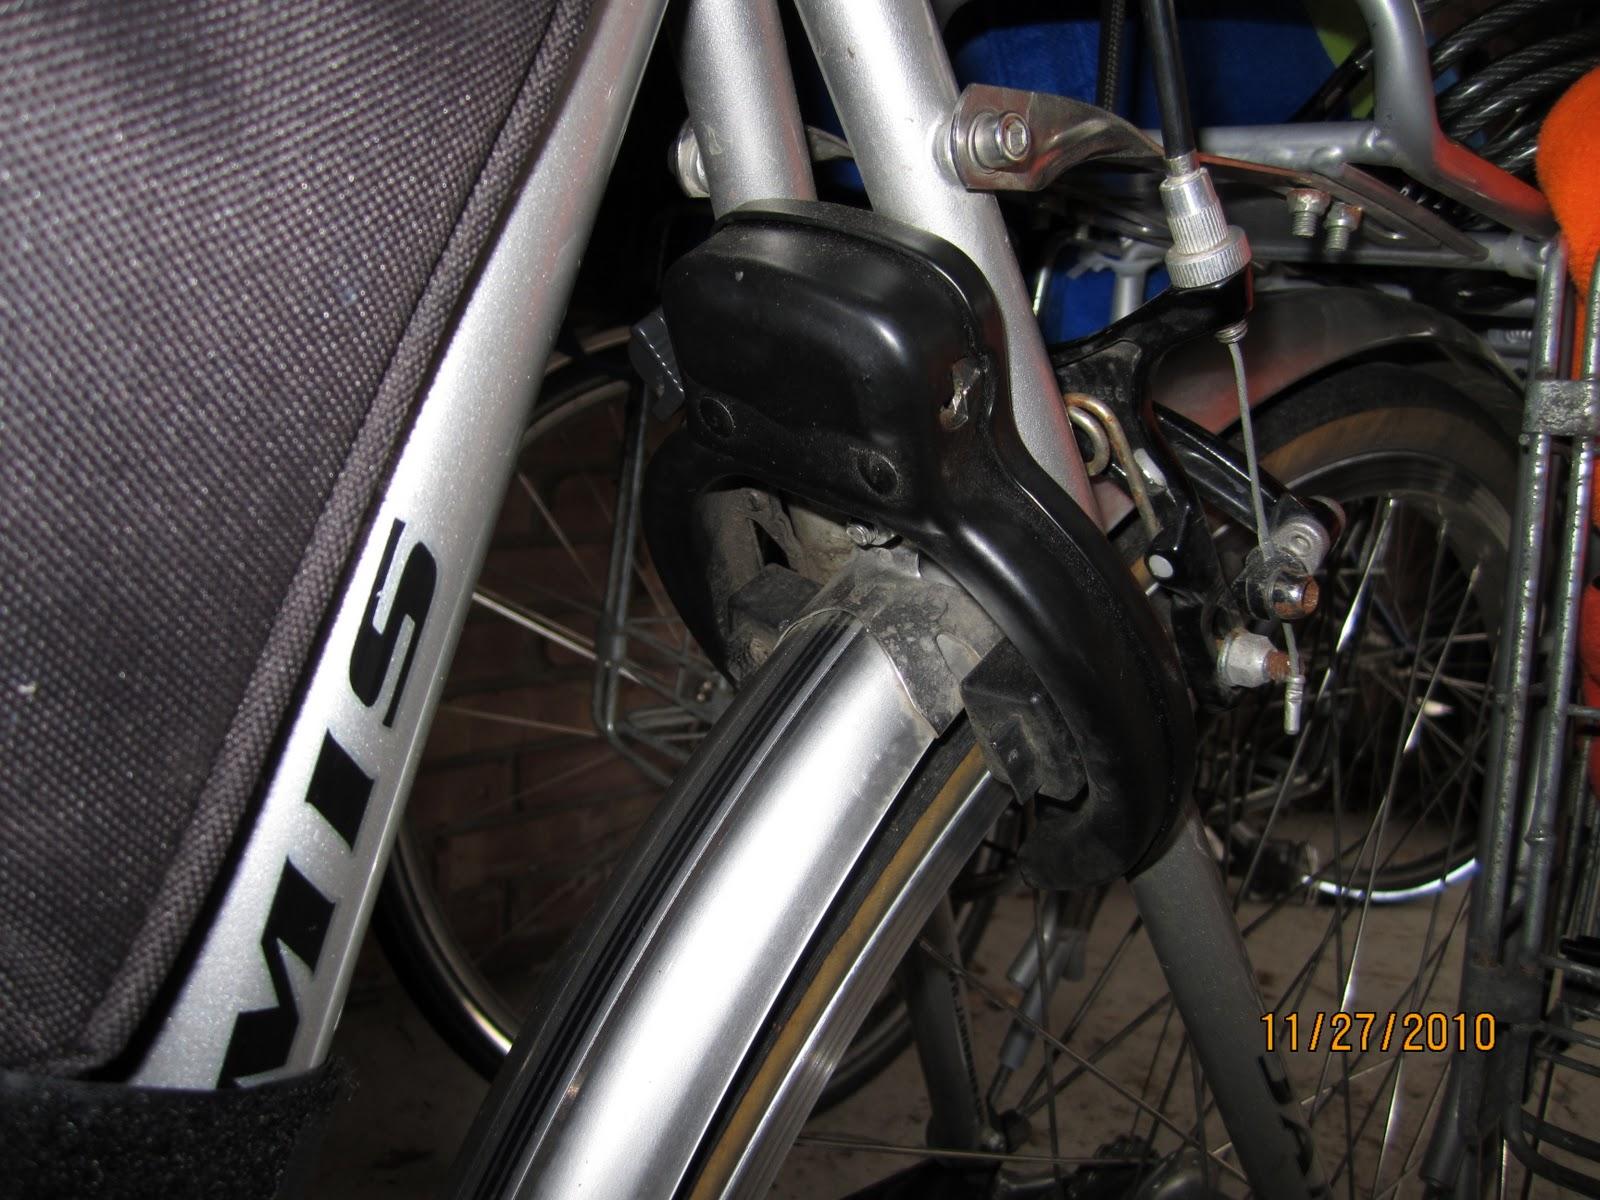 Bike Lock Frame Lock Ringschloß Axa Defender-Rl Rahmenbolzen Installation